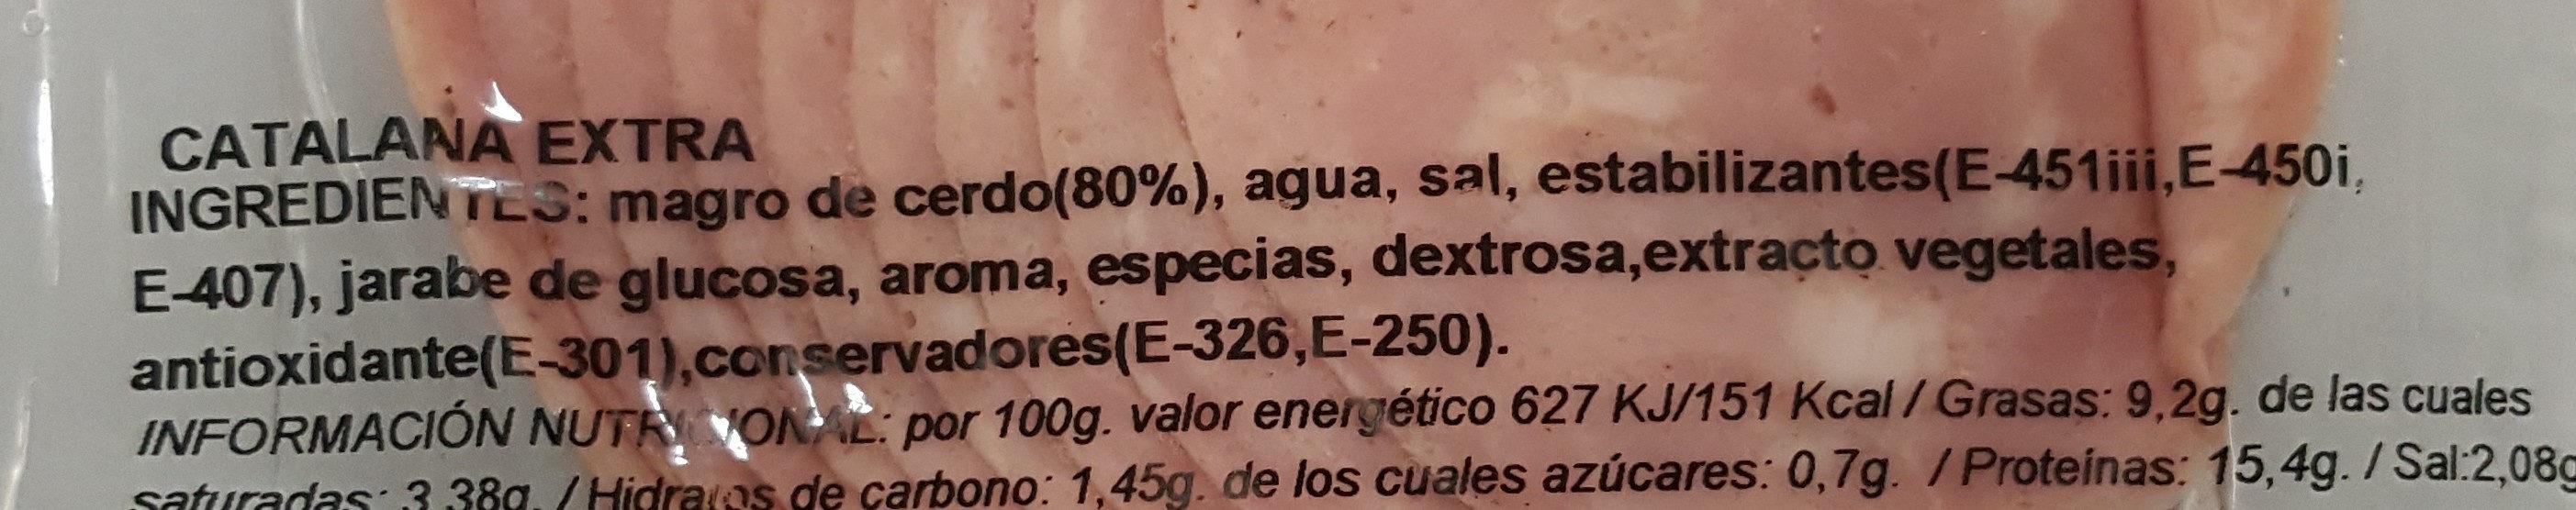 Catalana extra - Ingredientes - es